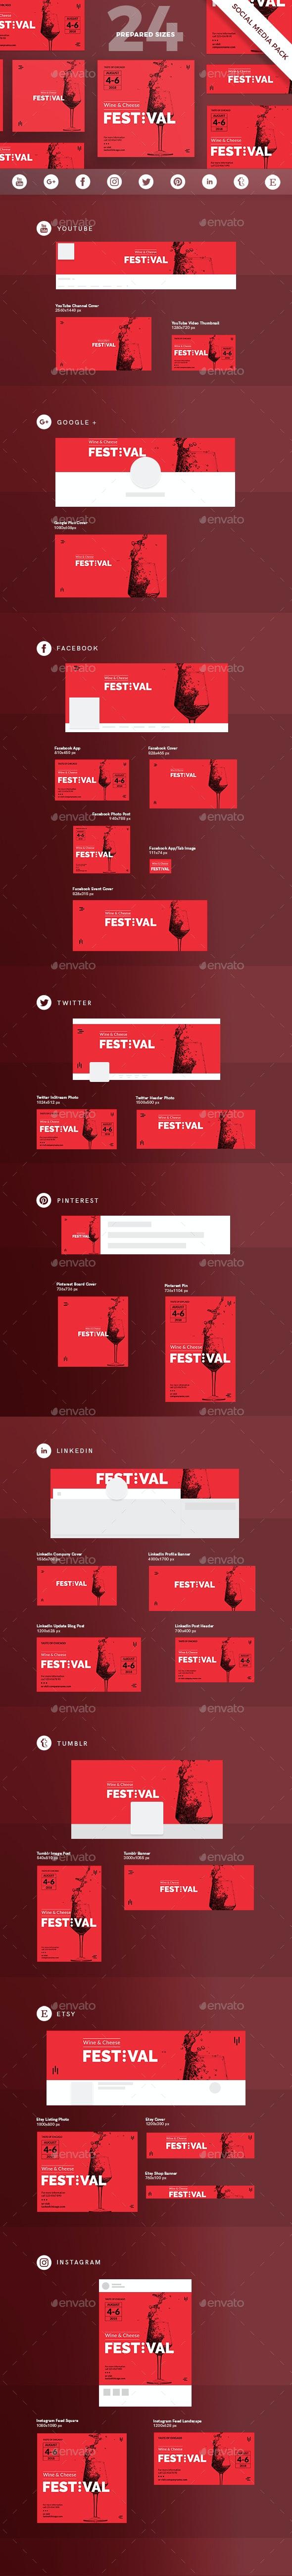 Wine Festival Social Media Pack - Miscellaneous Social Media